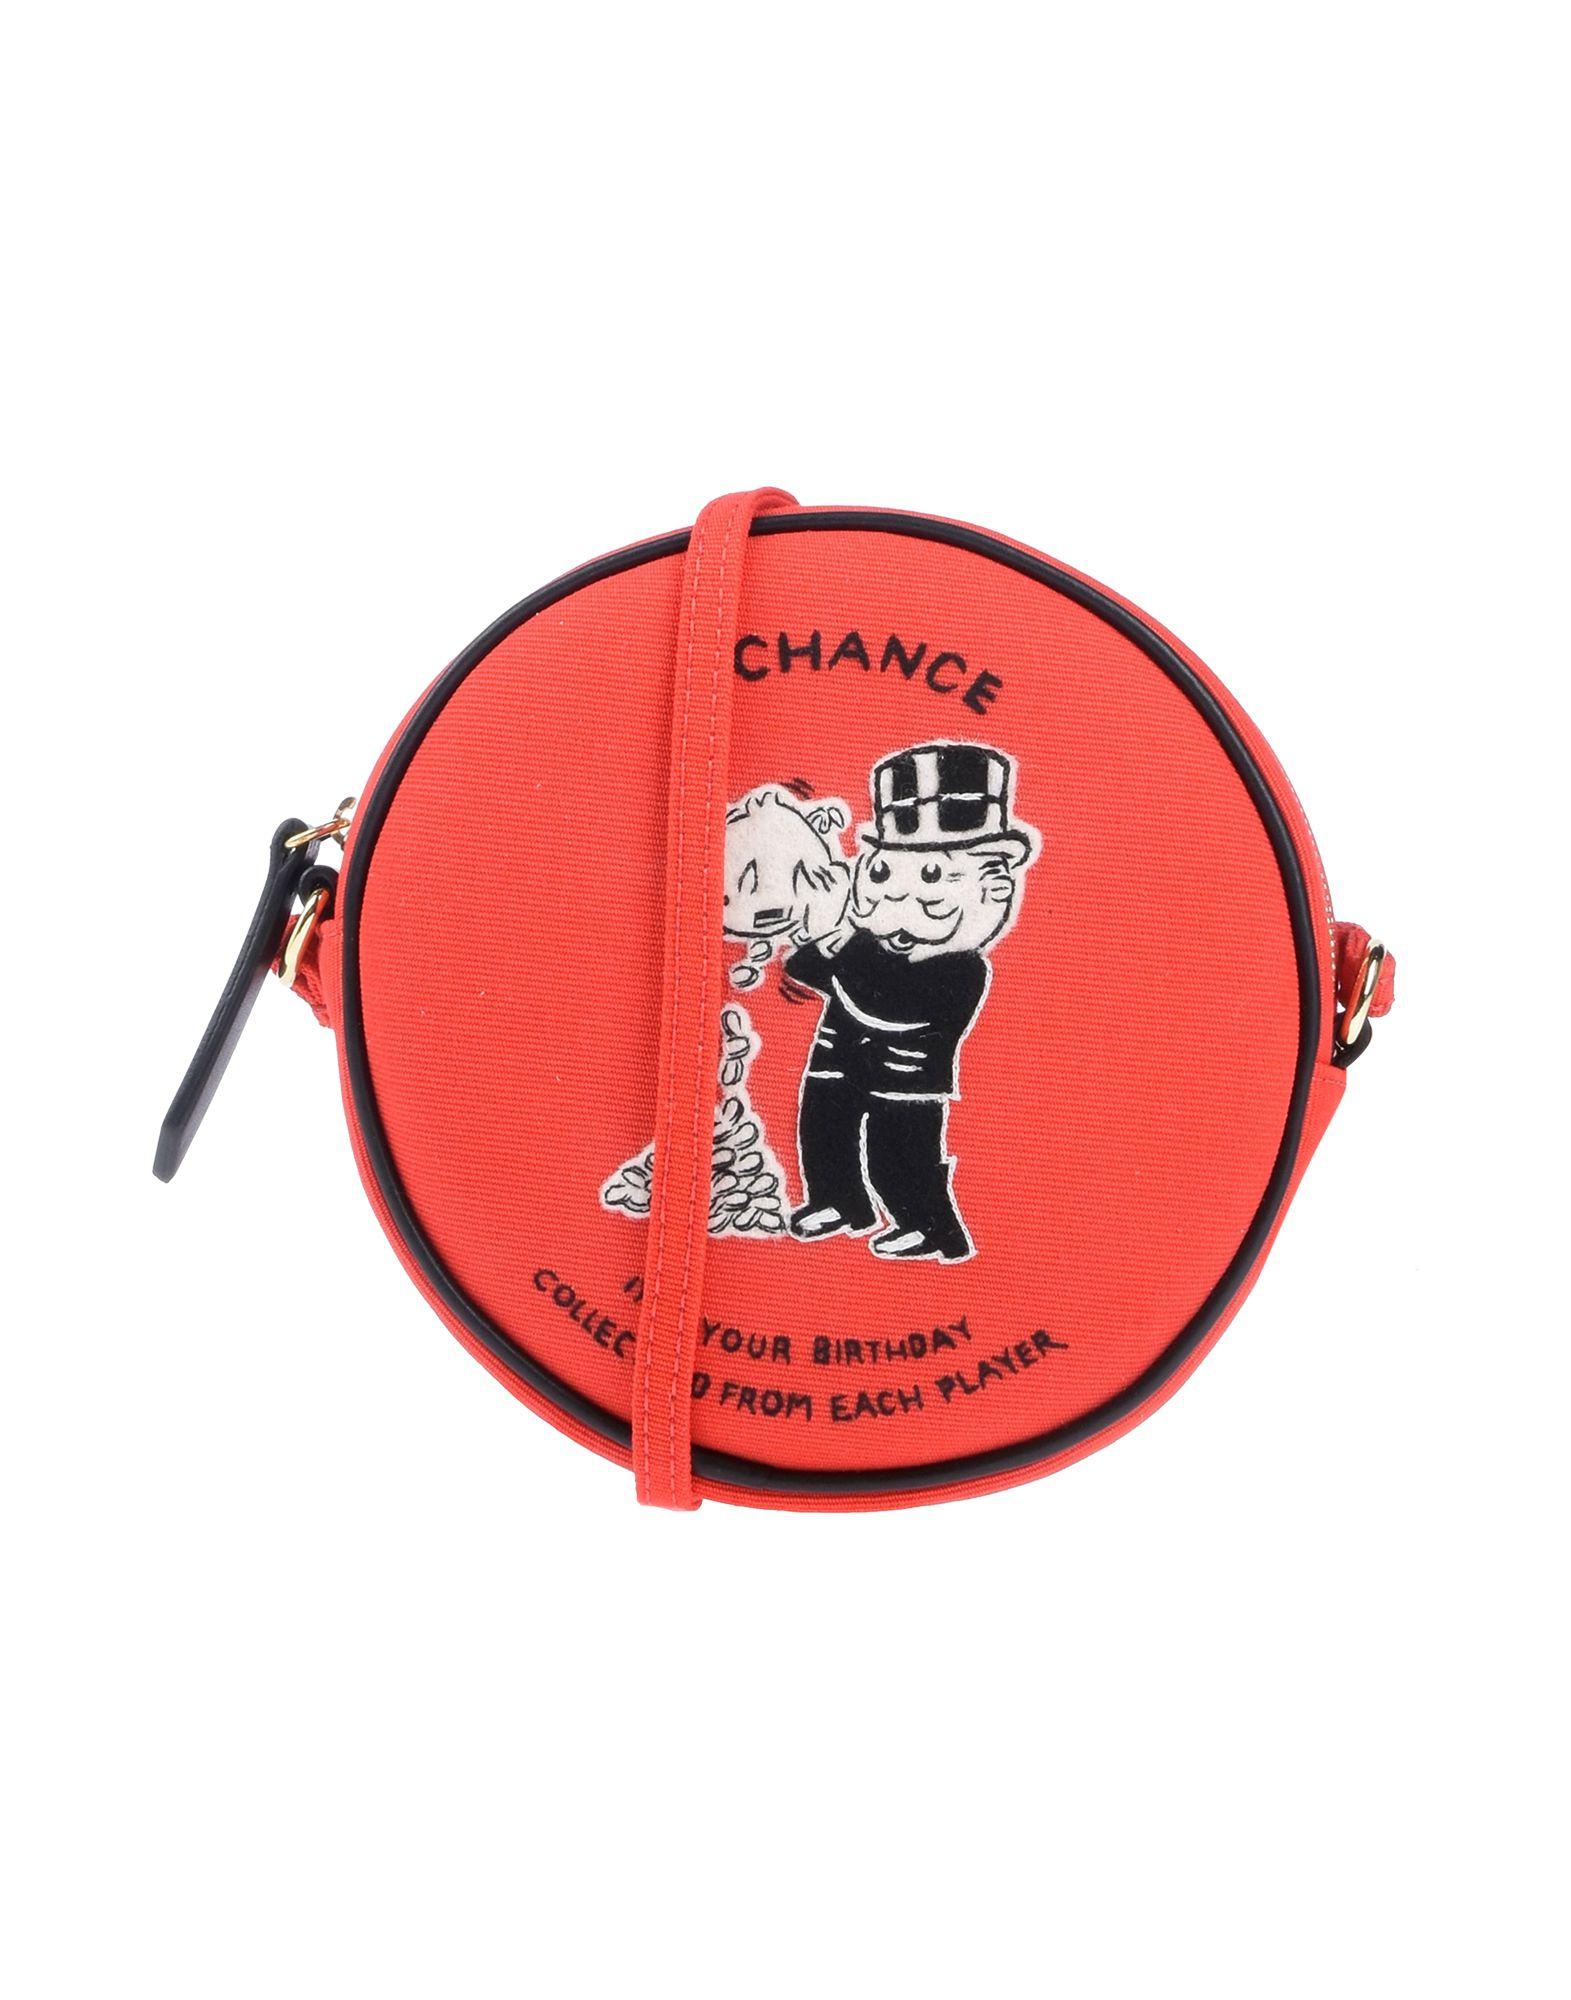 OLYMPIA LE-TAN Сумка через плечо сумка через плечо anais gvani croco ag 1471 350161